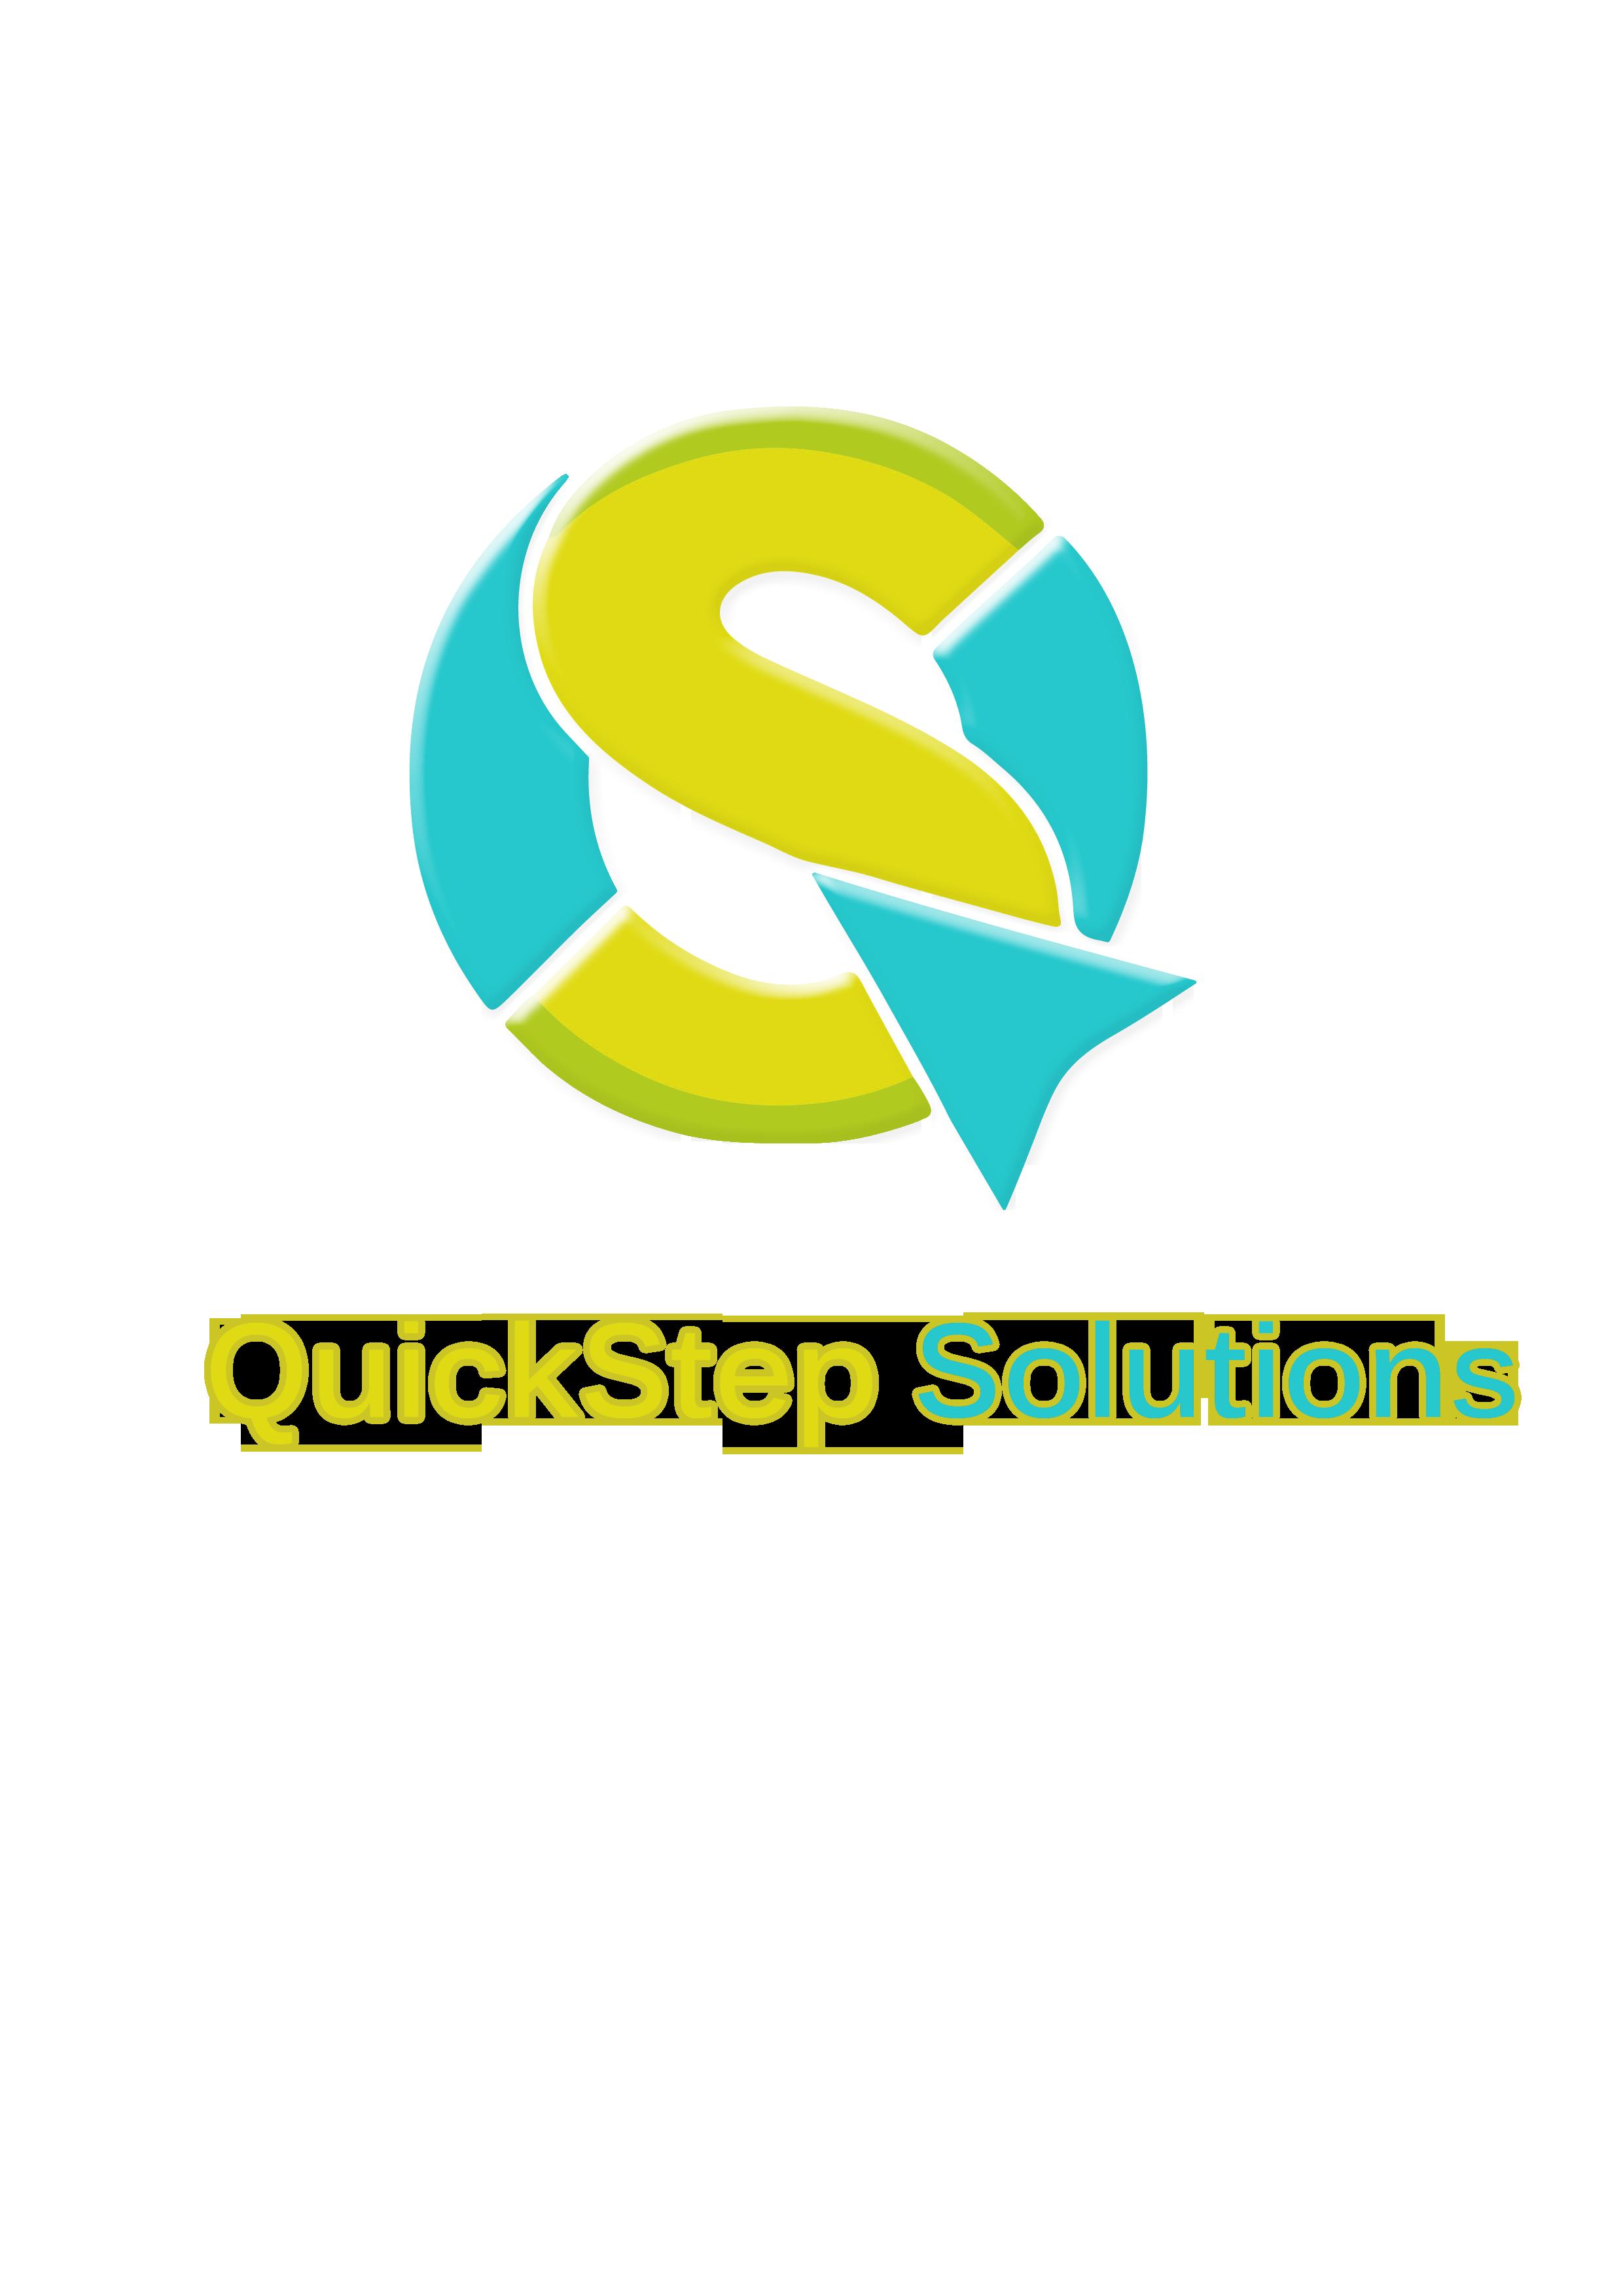 Quickstep Solutions